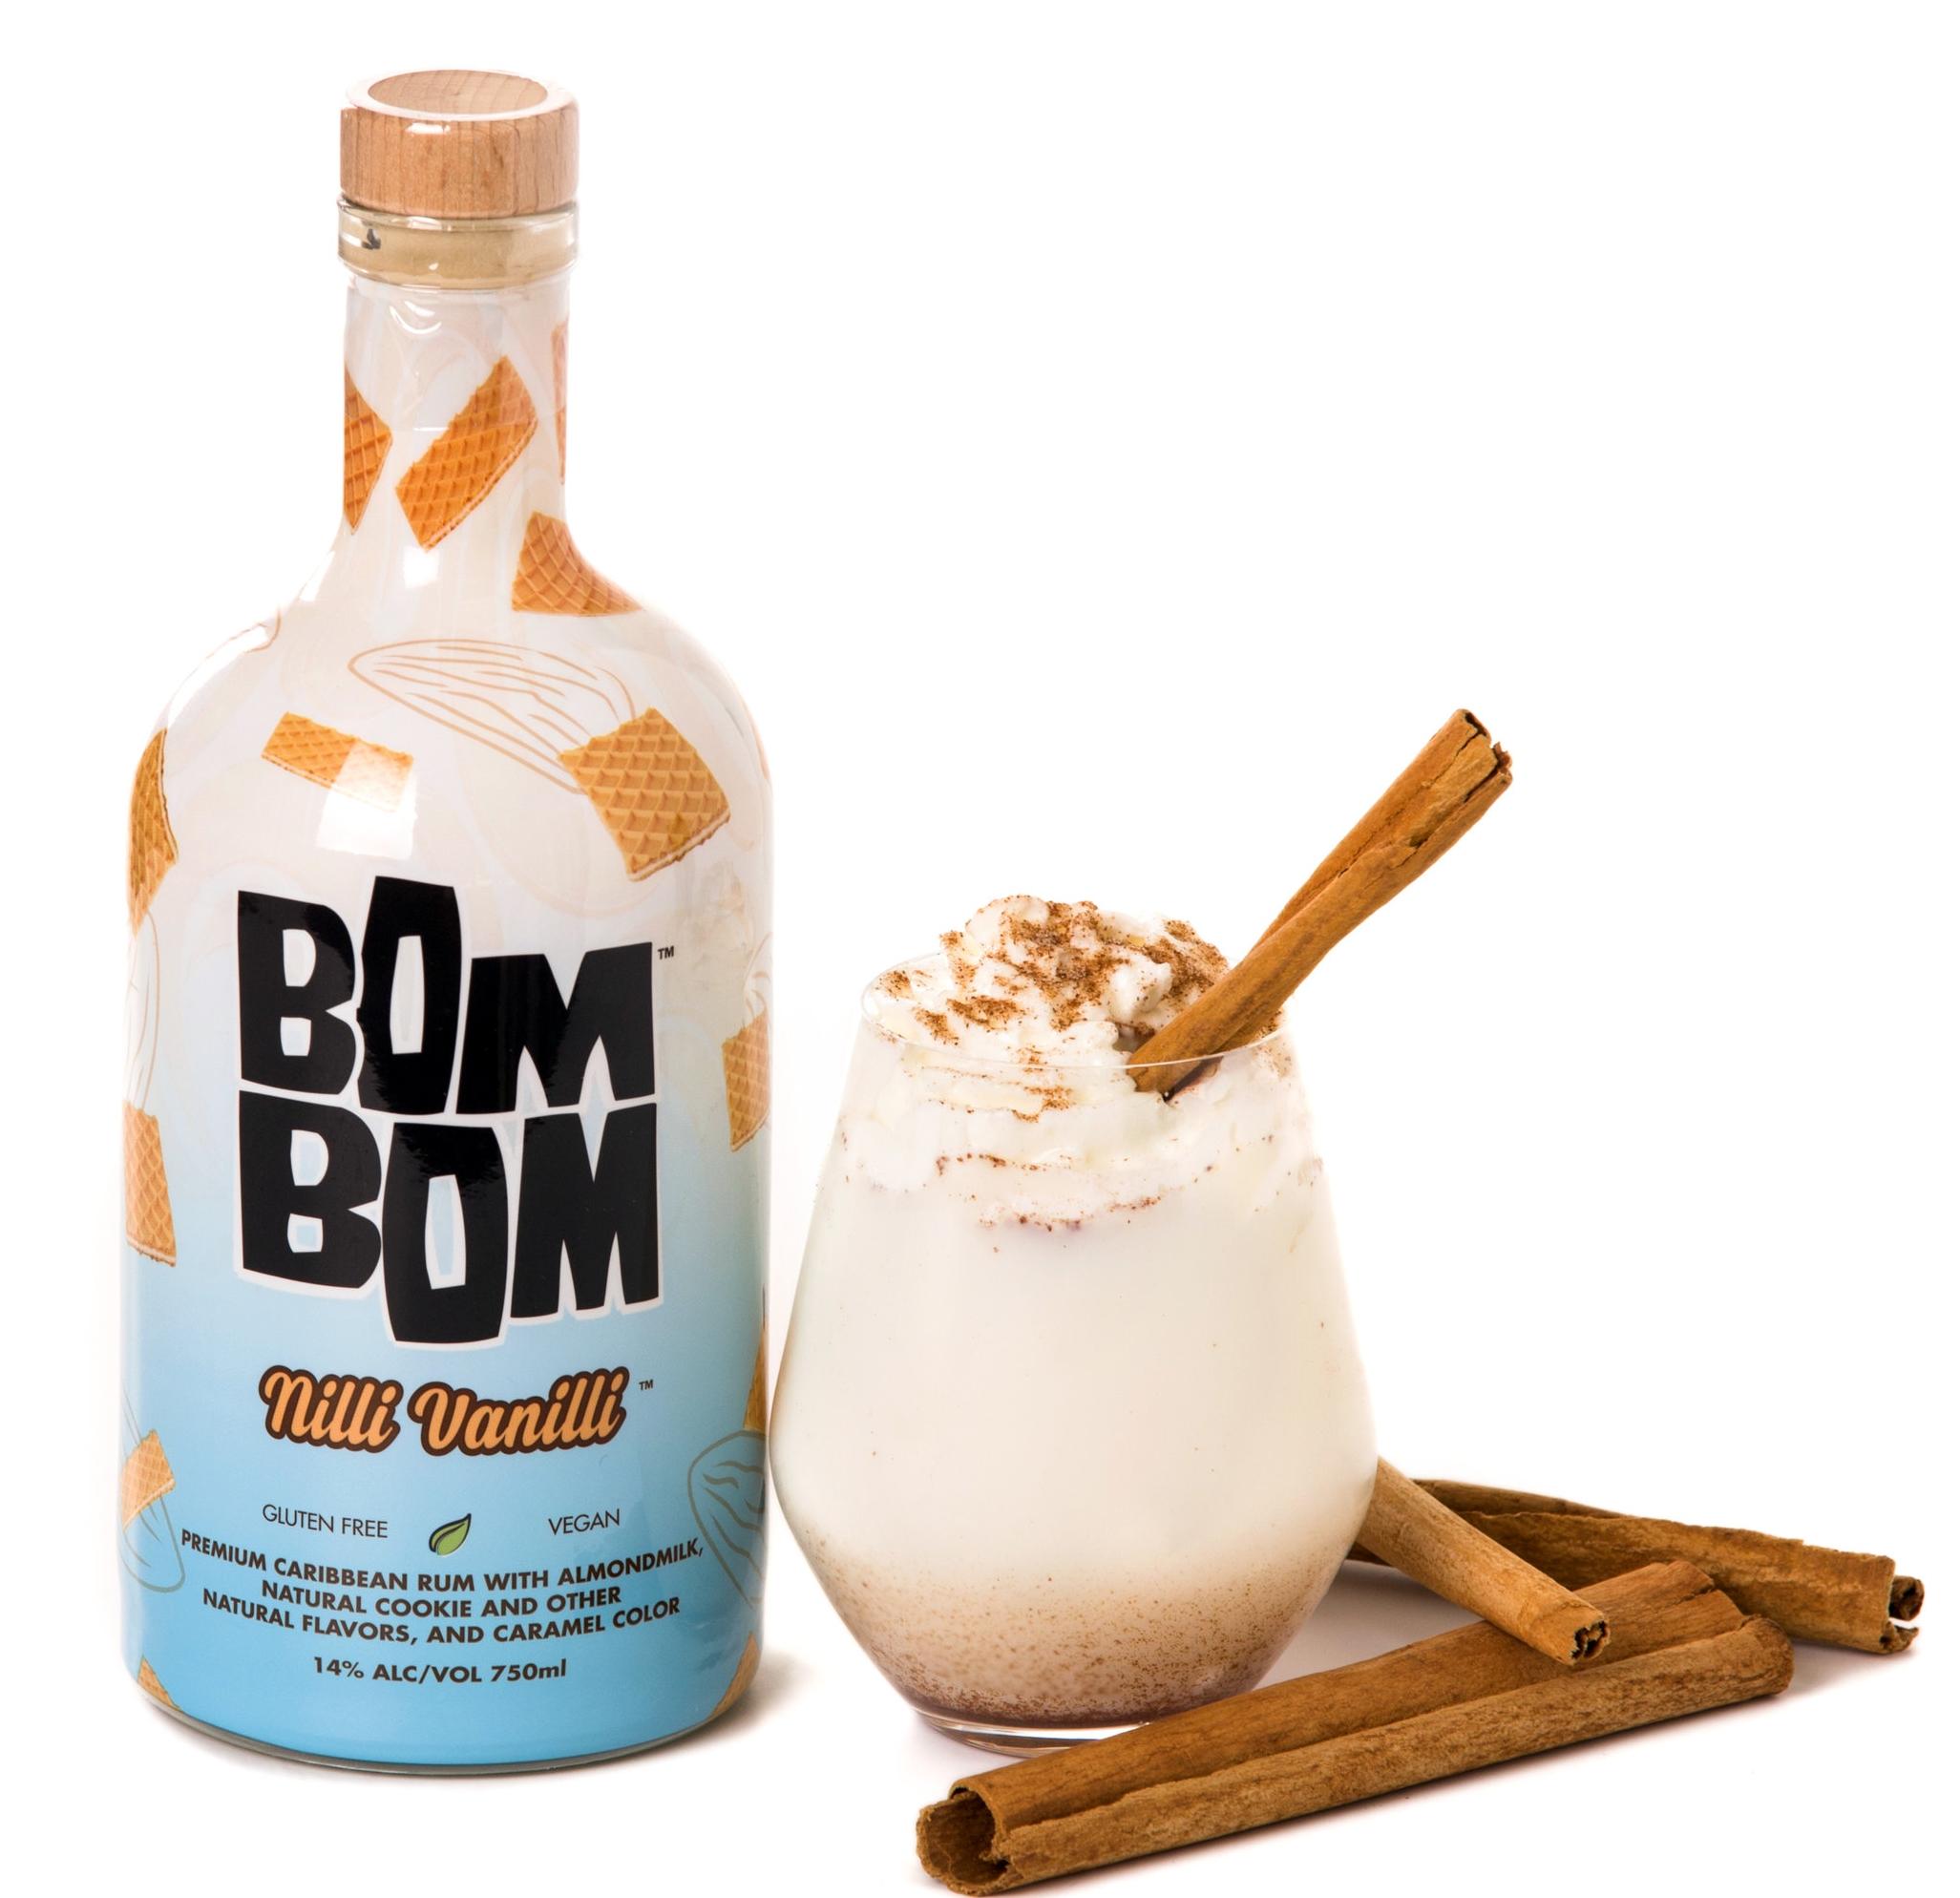 BOM BOM HOLIDAY Drinks Skinny Egg Nog Delite with Nilli Vanilli and Cinnamon Stick.JPG